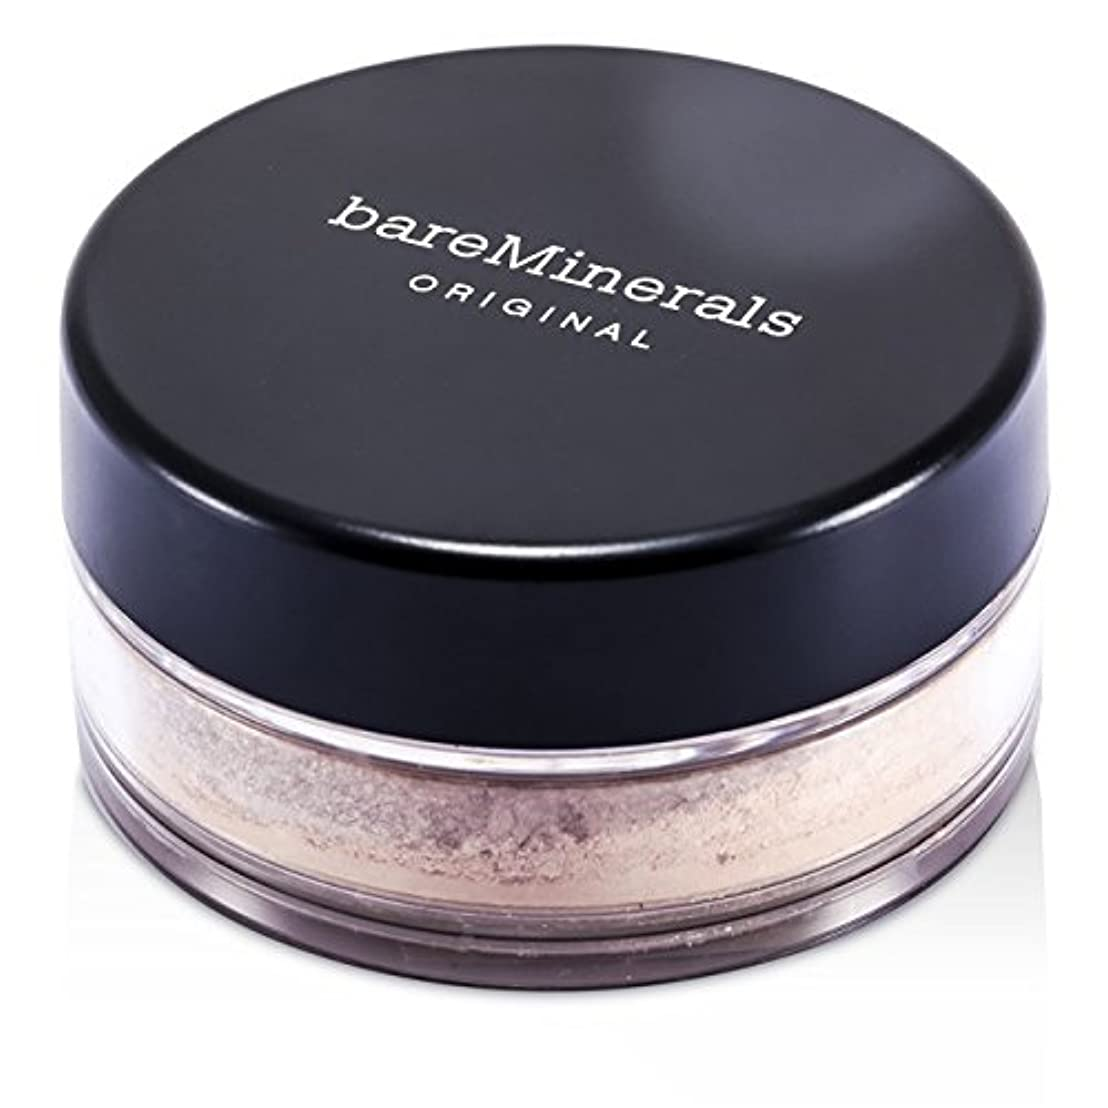 BareMinerals ベアミネラルオリジナル SPF 15 ファンデーション - # Fair ( C10 ) 8g/0.28oz並行輸入品